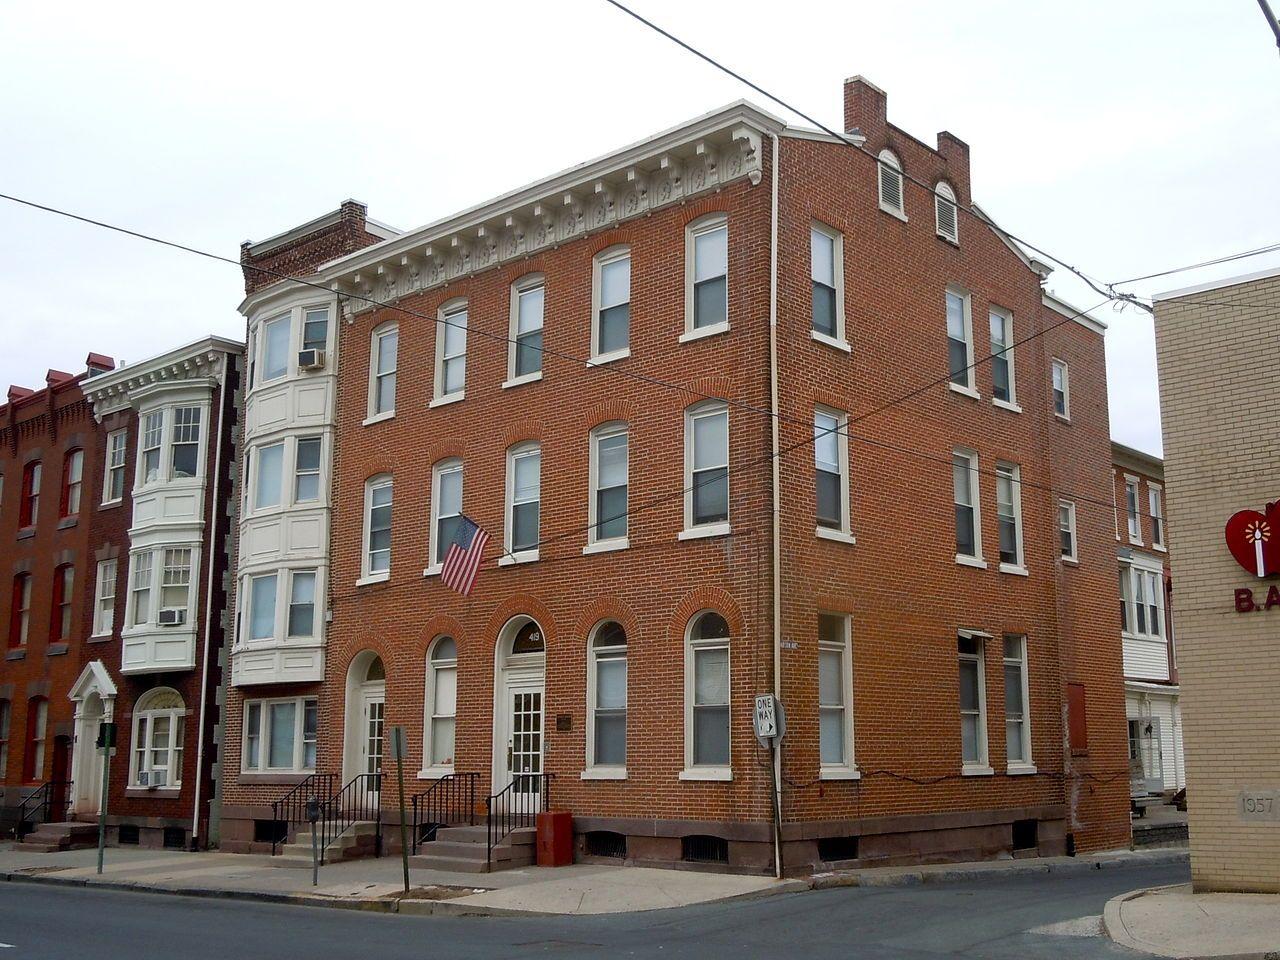 Livingood House-Stryker Hospital in Berks County, Pennsylvania.